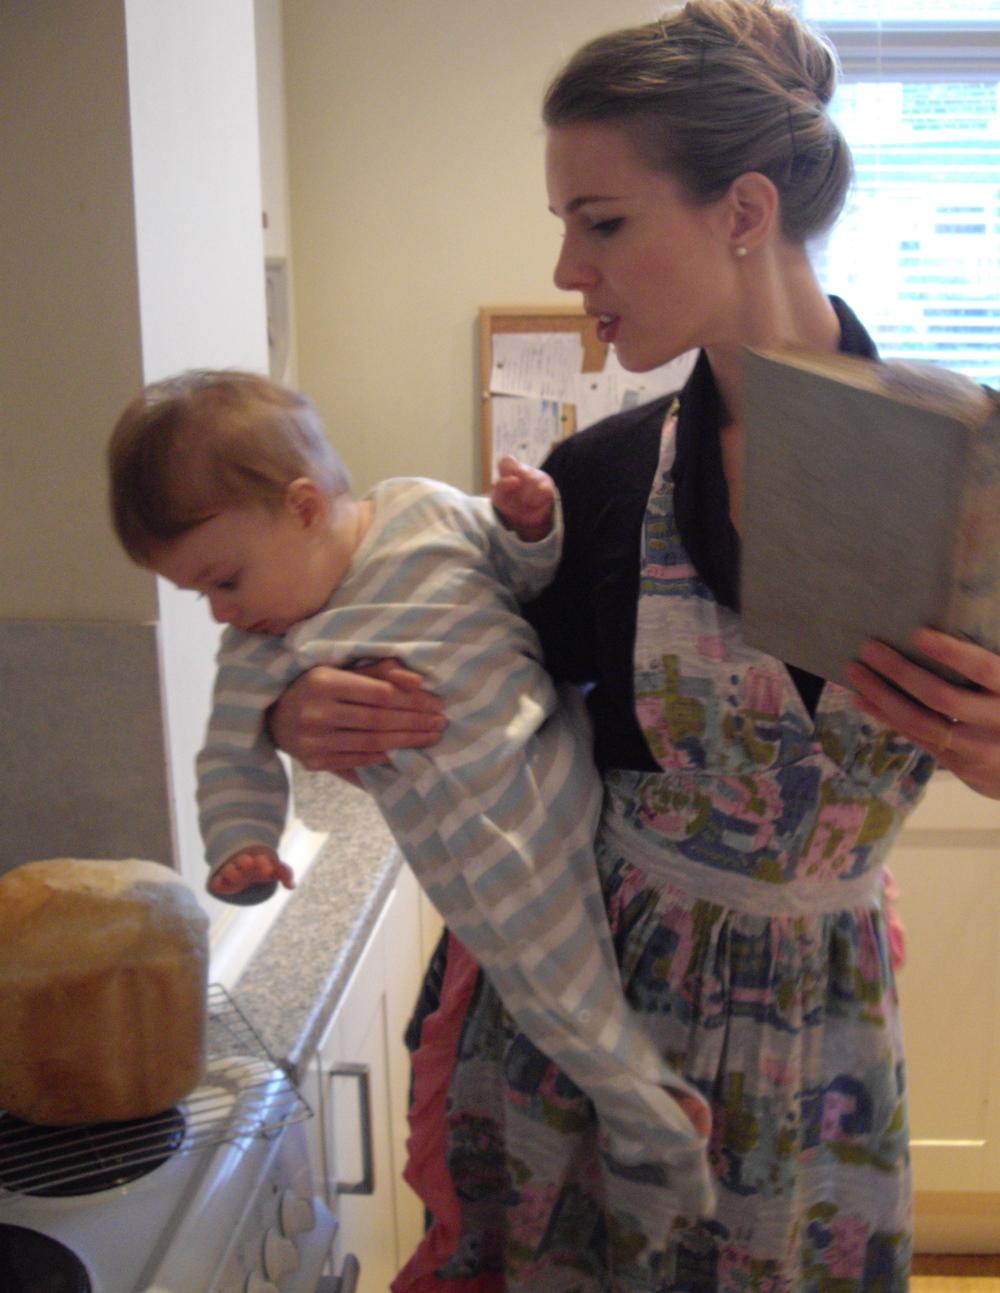 Mummy bake - Powder compact diaries